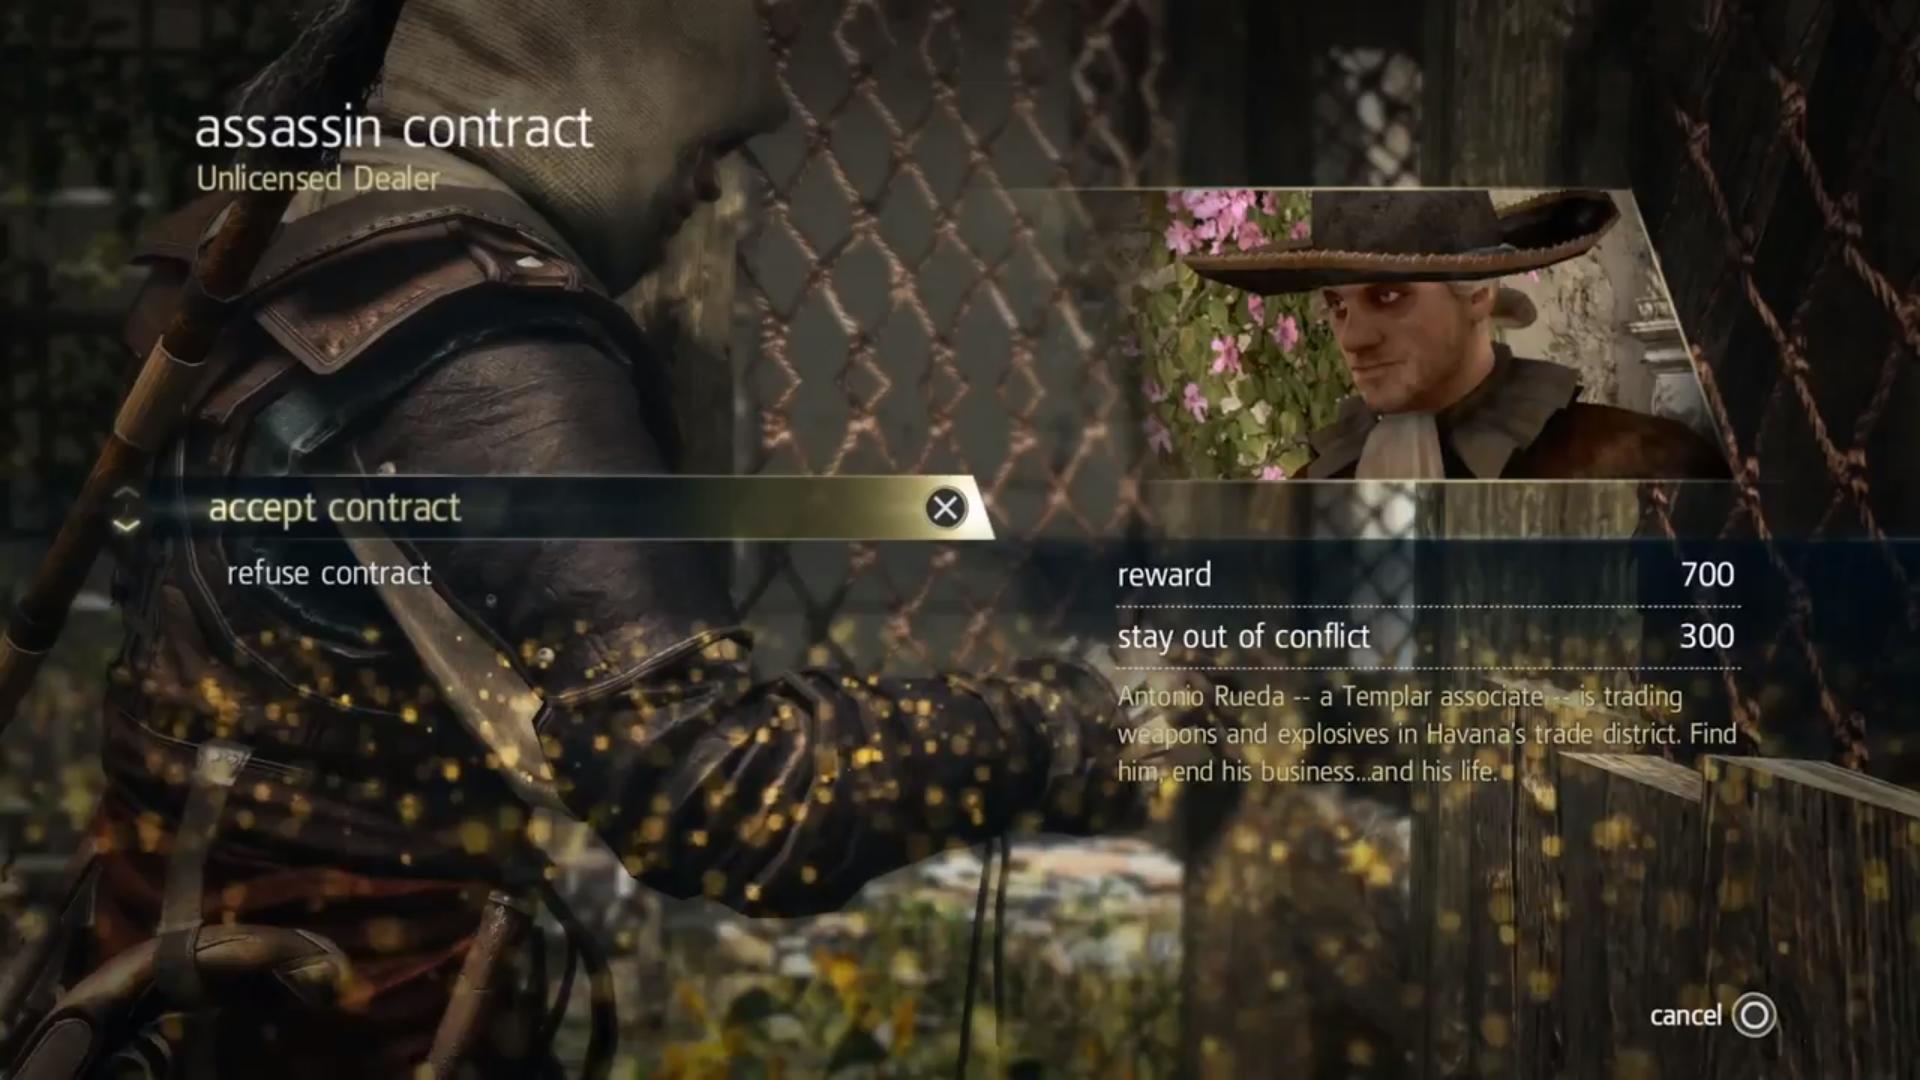 Assassin S Creed Iv Black Flag Walkthrough Video Shows Stealth Gameplay Assassin Creed Black Flag